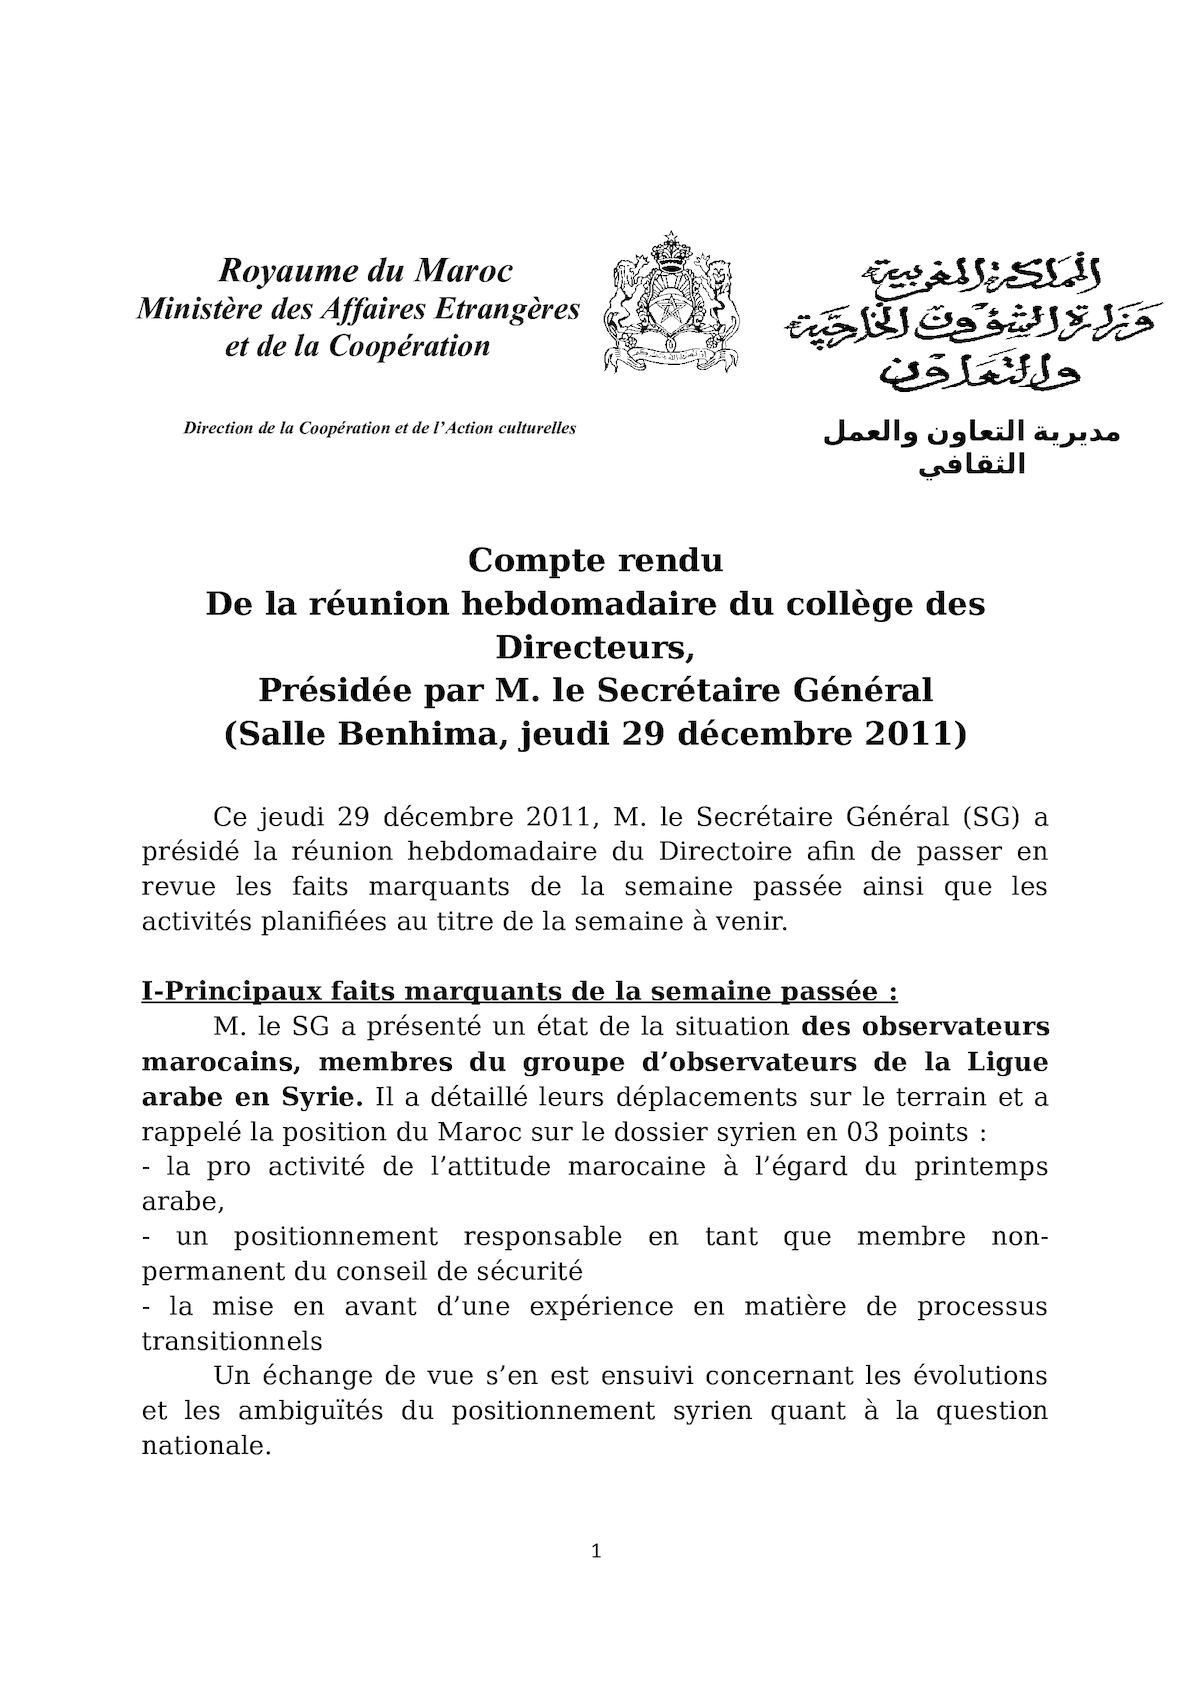 Cr Directoire 29 12 11